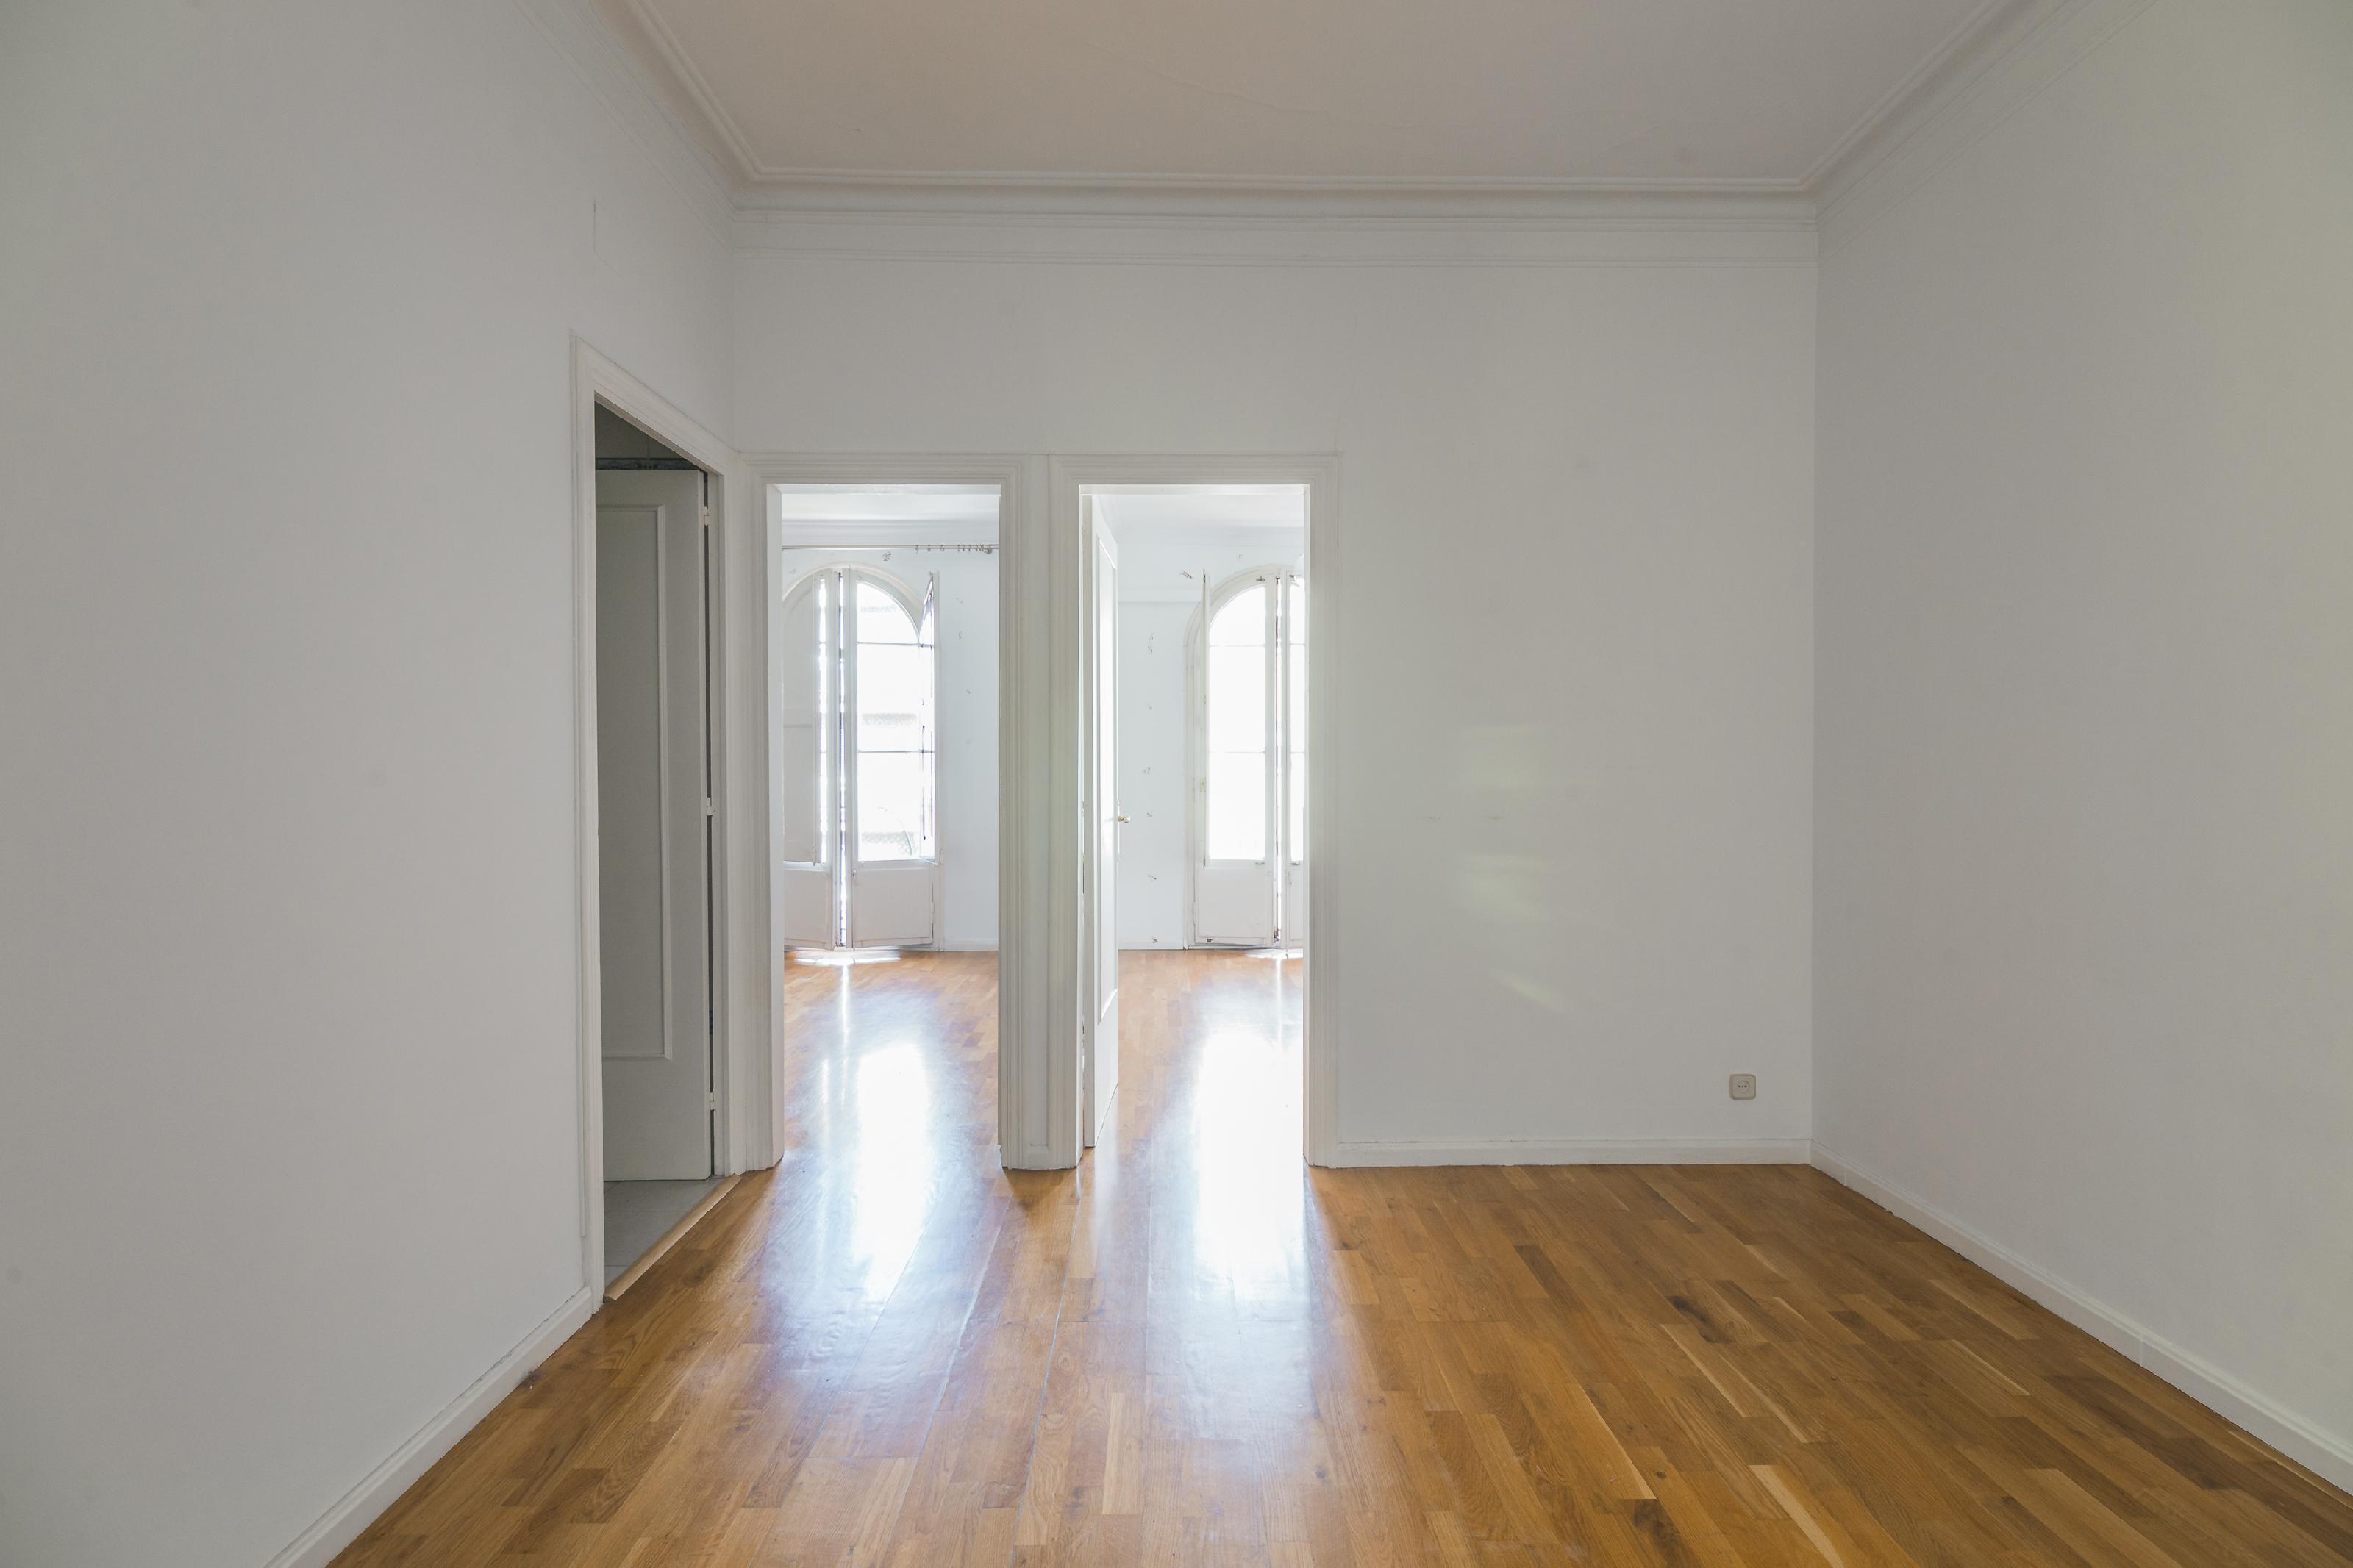 246907 Flat for sale in Eixample, Nova Esquerra Eixample 24